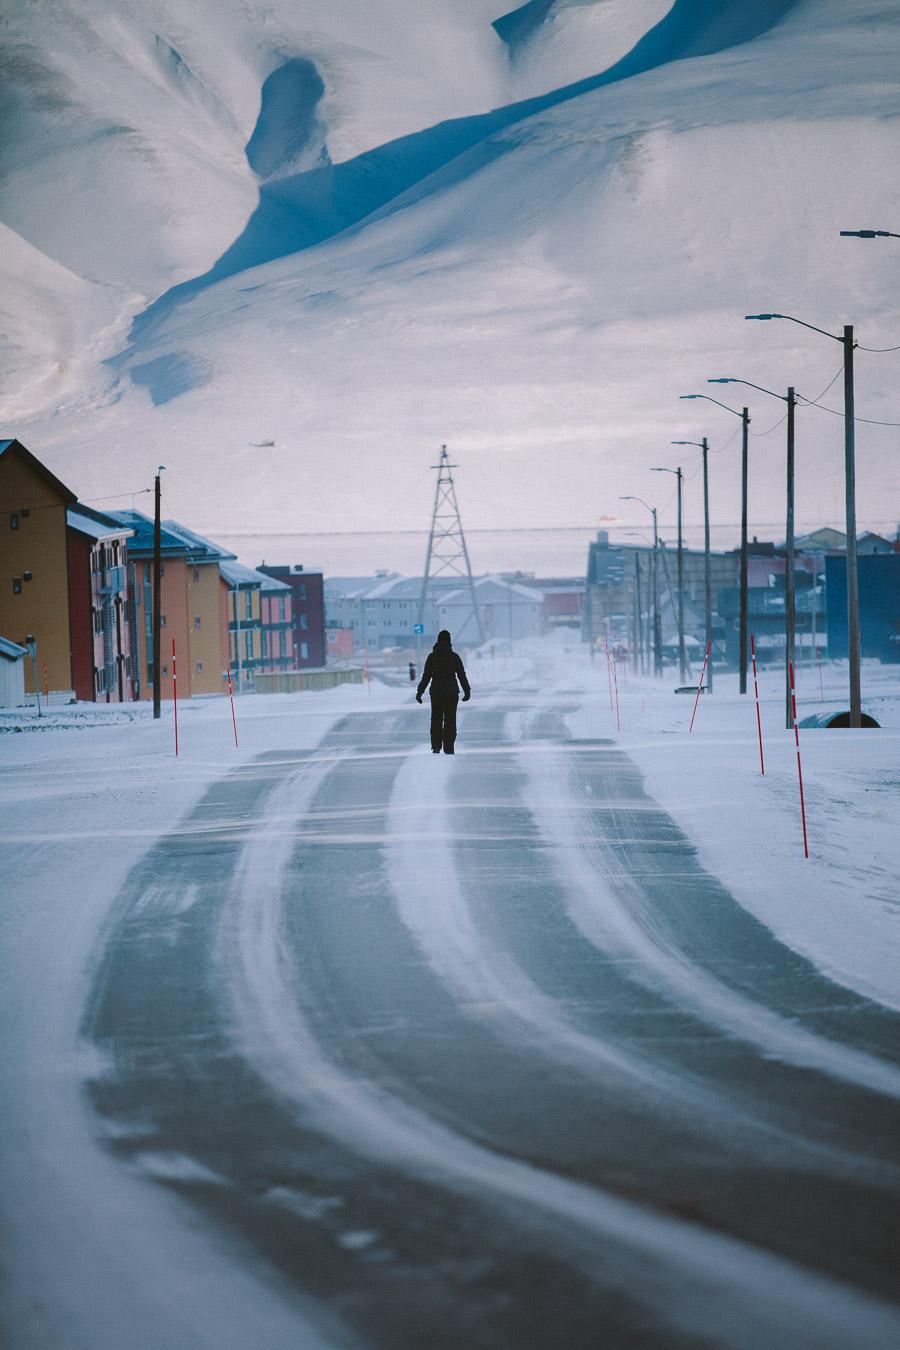 Person walking down a snowy street